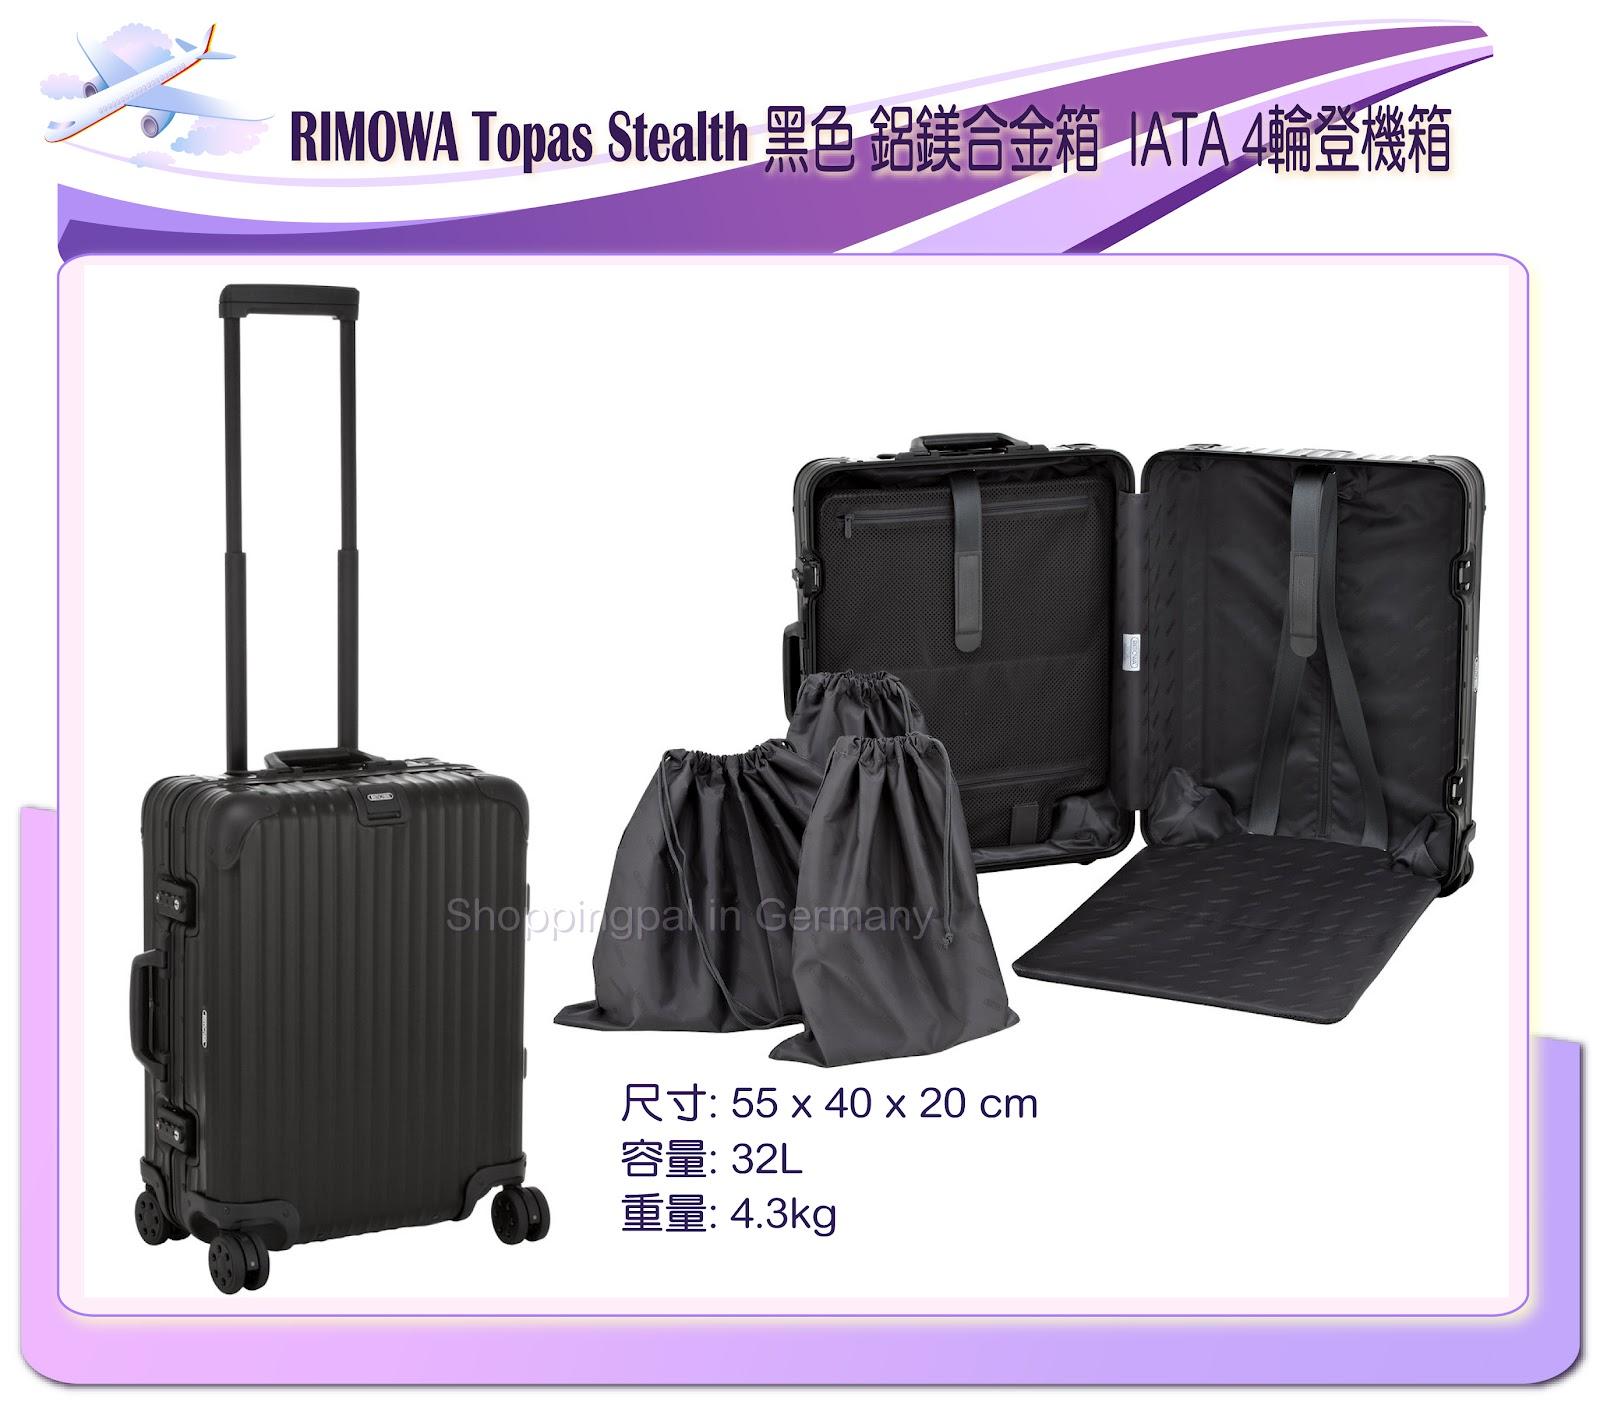 RIMOWA Topas Stealth 4輪&2輪 登機箱 ShoppingPal in Germany 德國代購服務